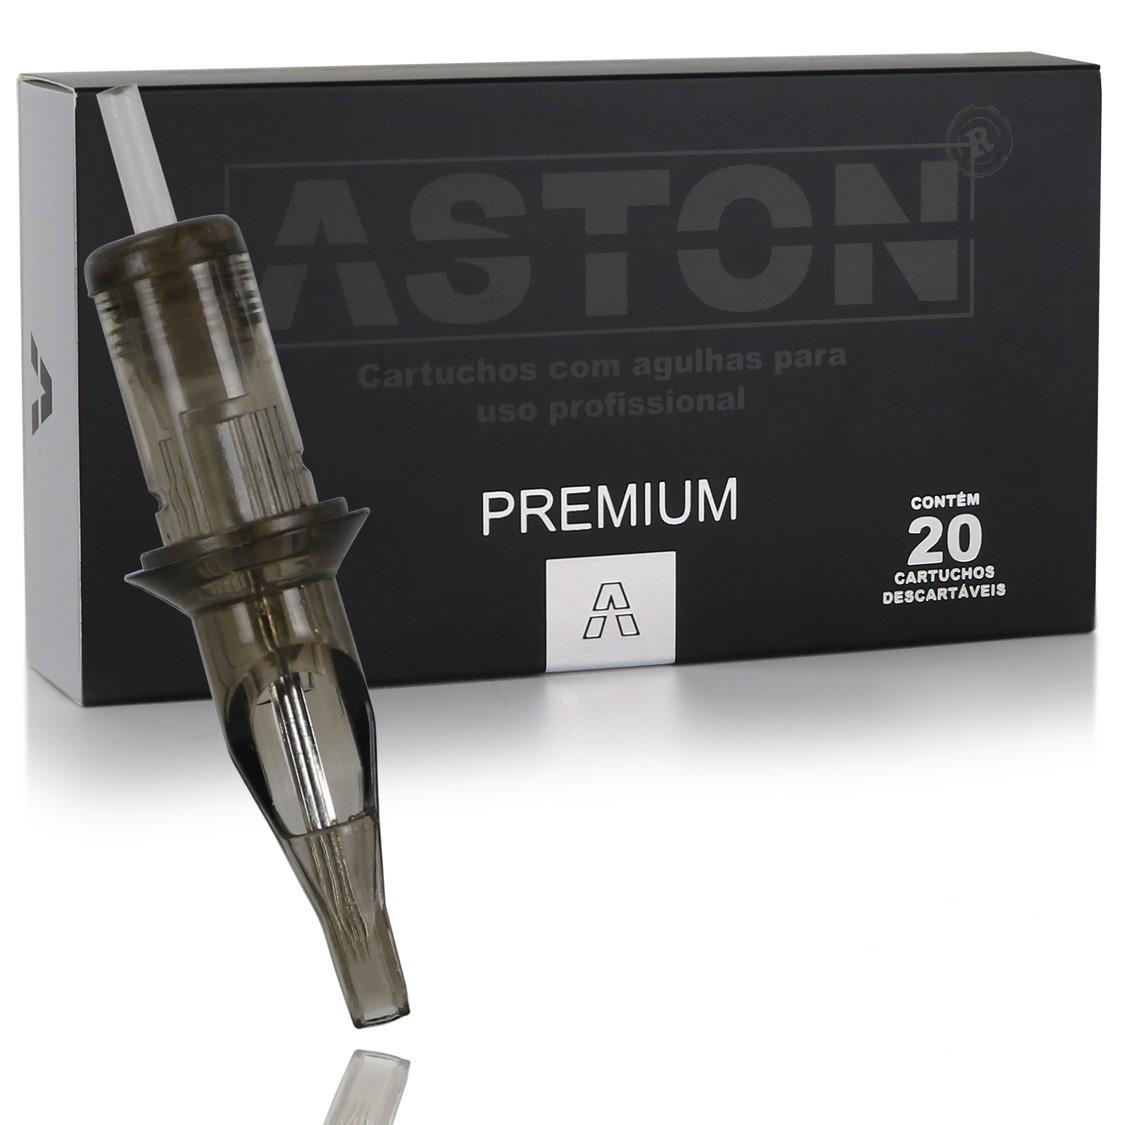 CAIXA CARTUCHO ASTON PREMIUM PINTURA MR (20 UN) - 1015MR